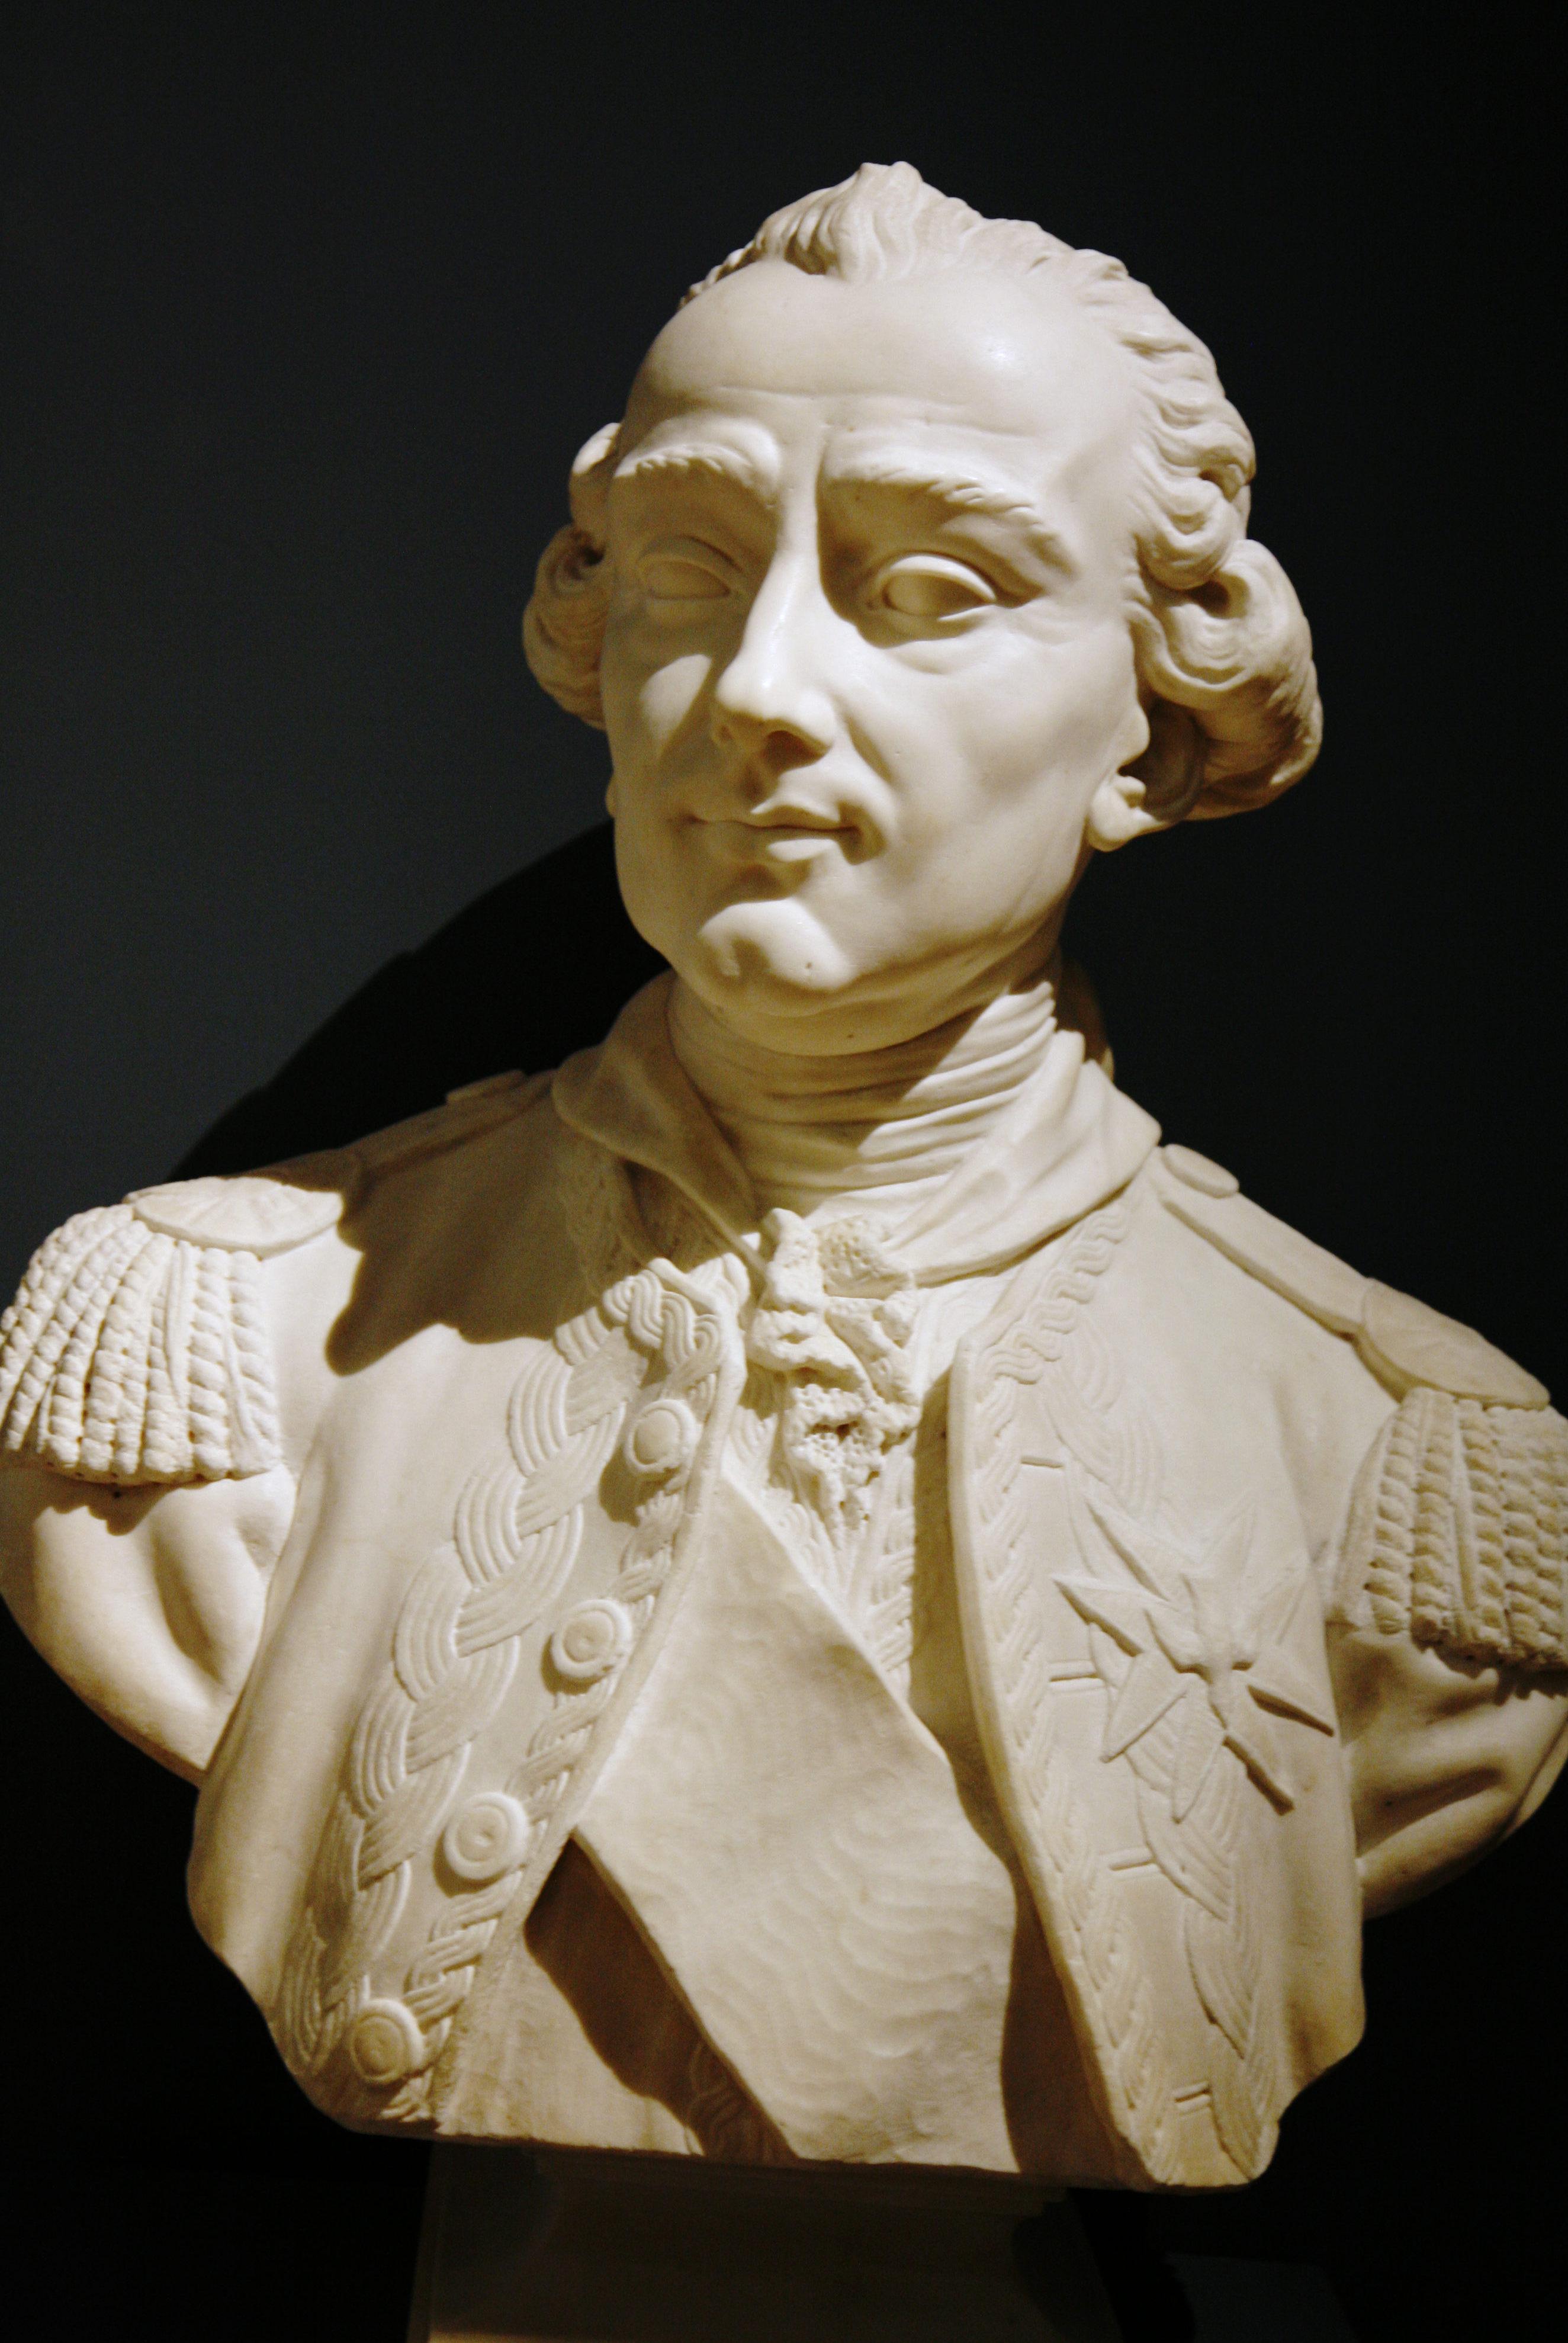 Jean-Pierre-Victor Huguenin: Charles Hector, comte d'Estaing